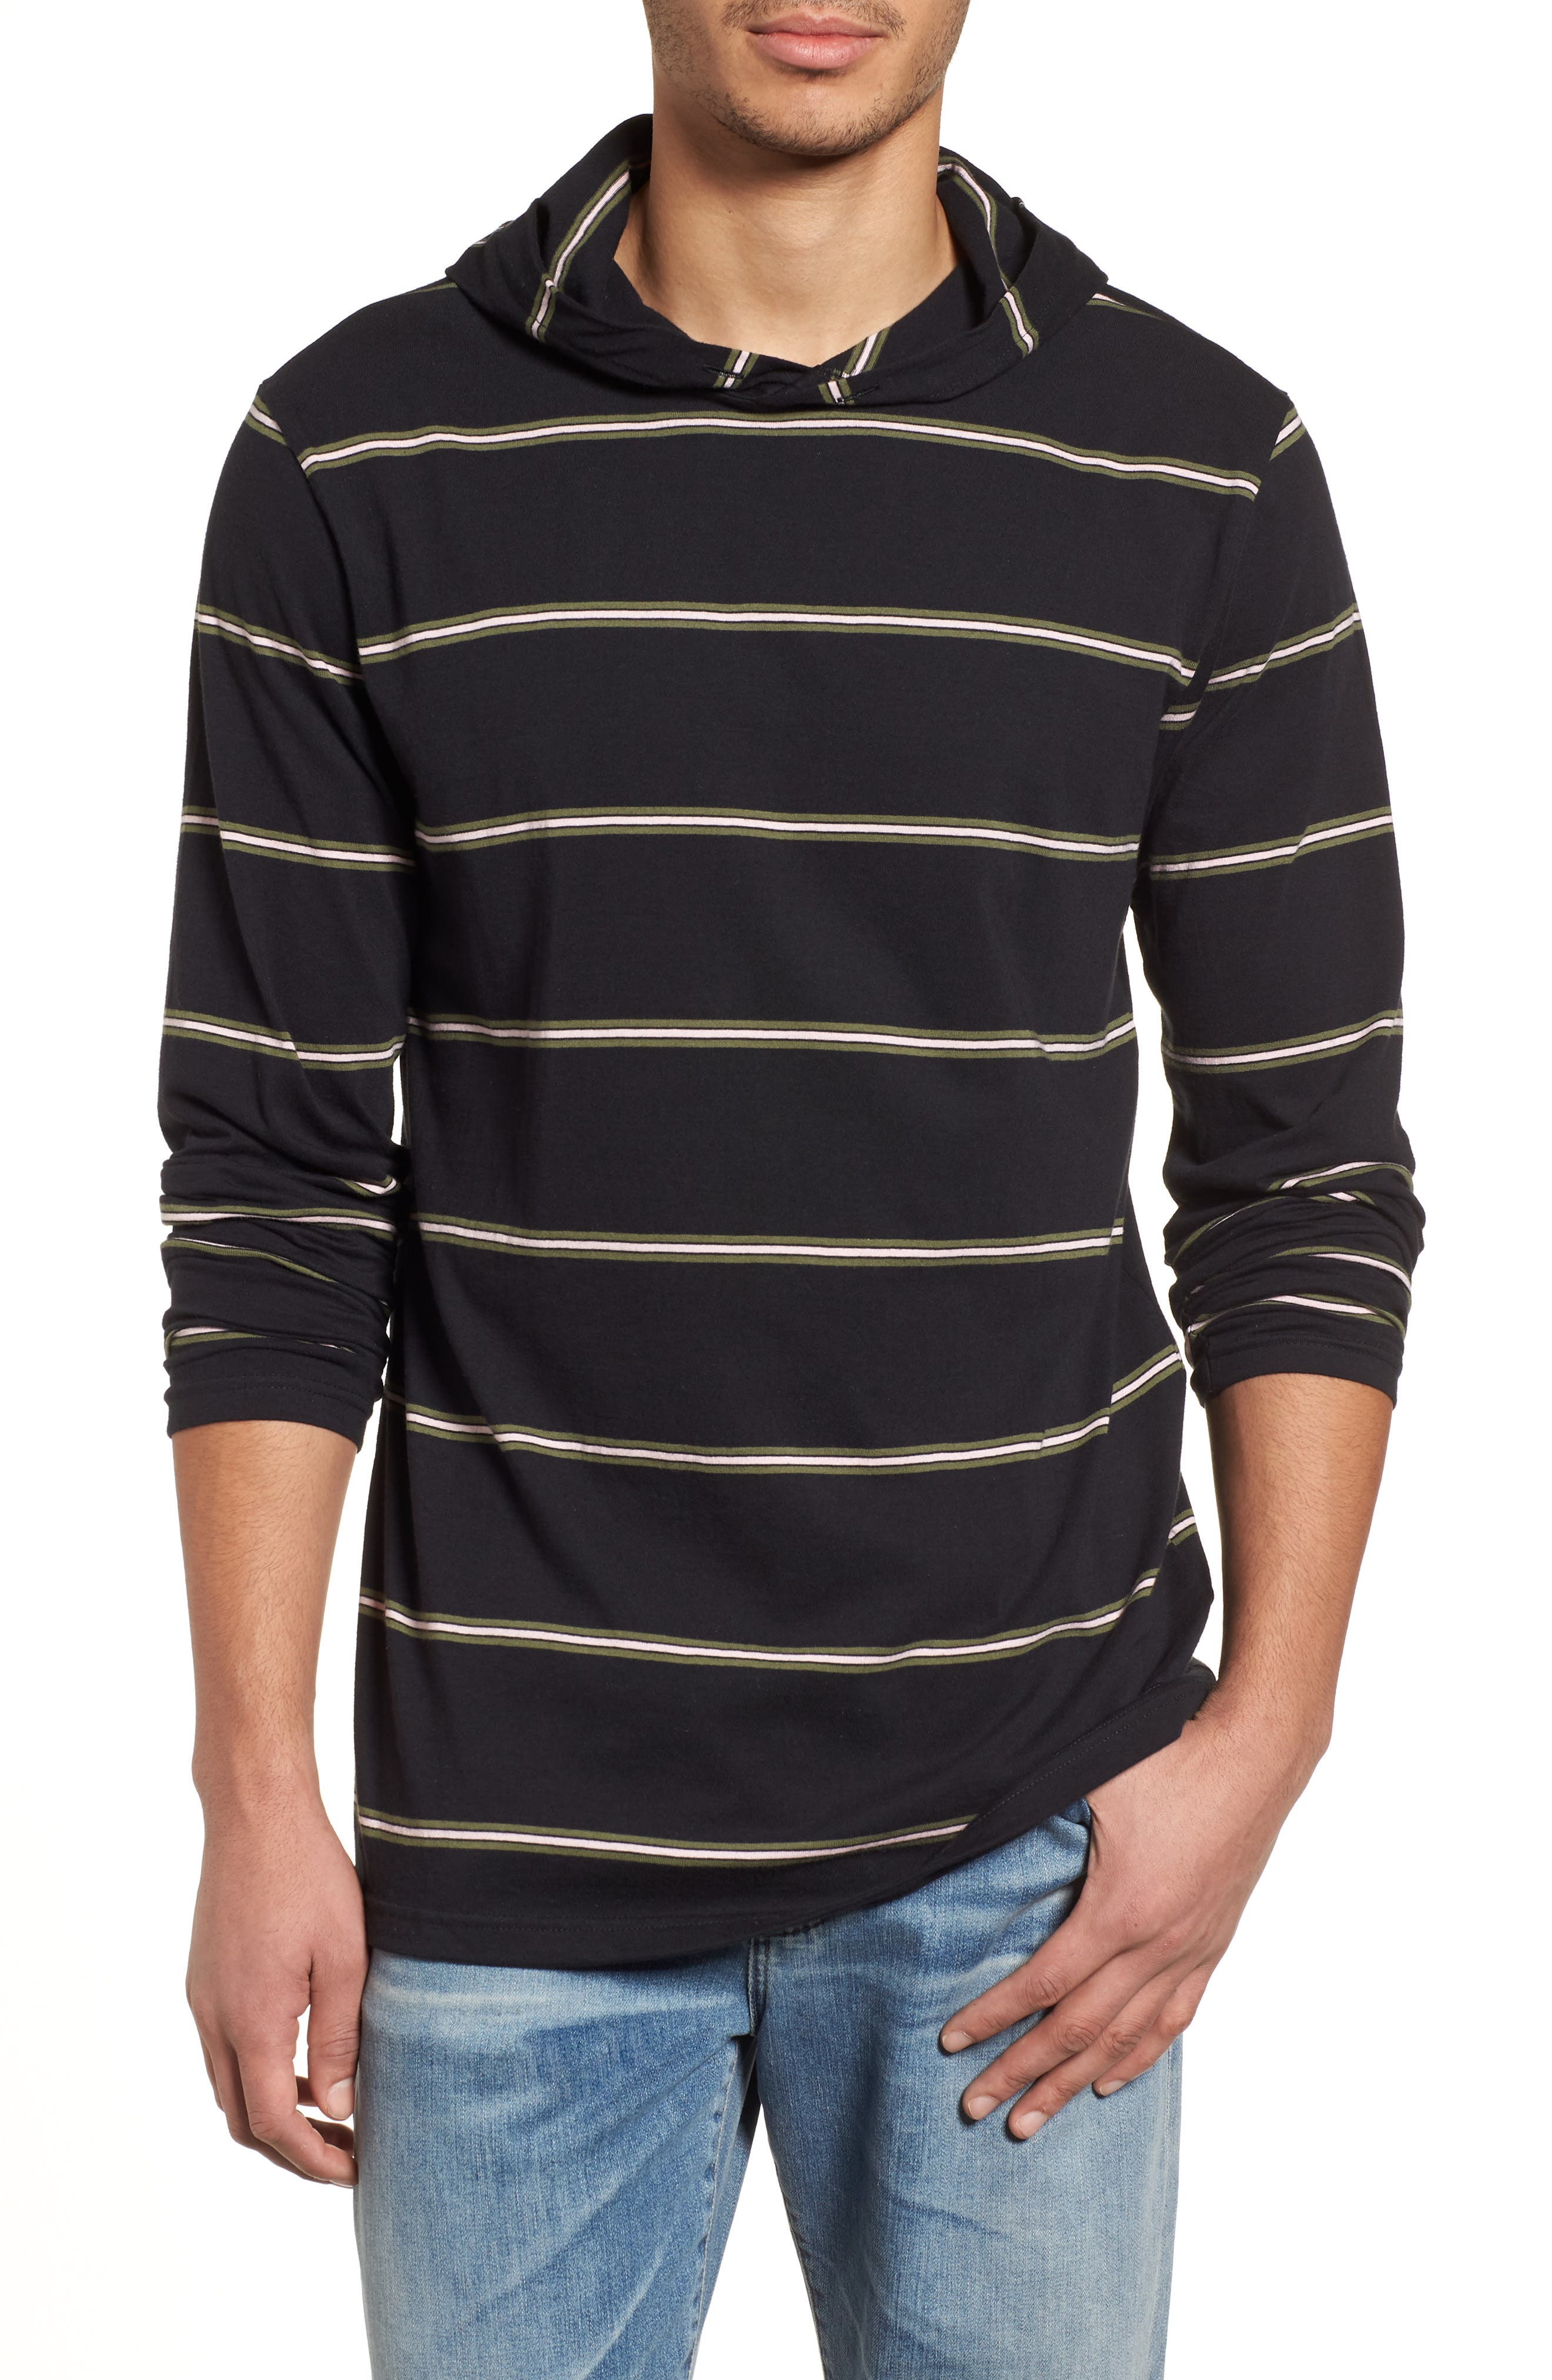 Die Cut Hooded Long Sleeve T-Shirt,                             Main thumbnail 1, color,                             001